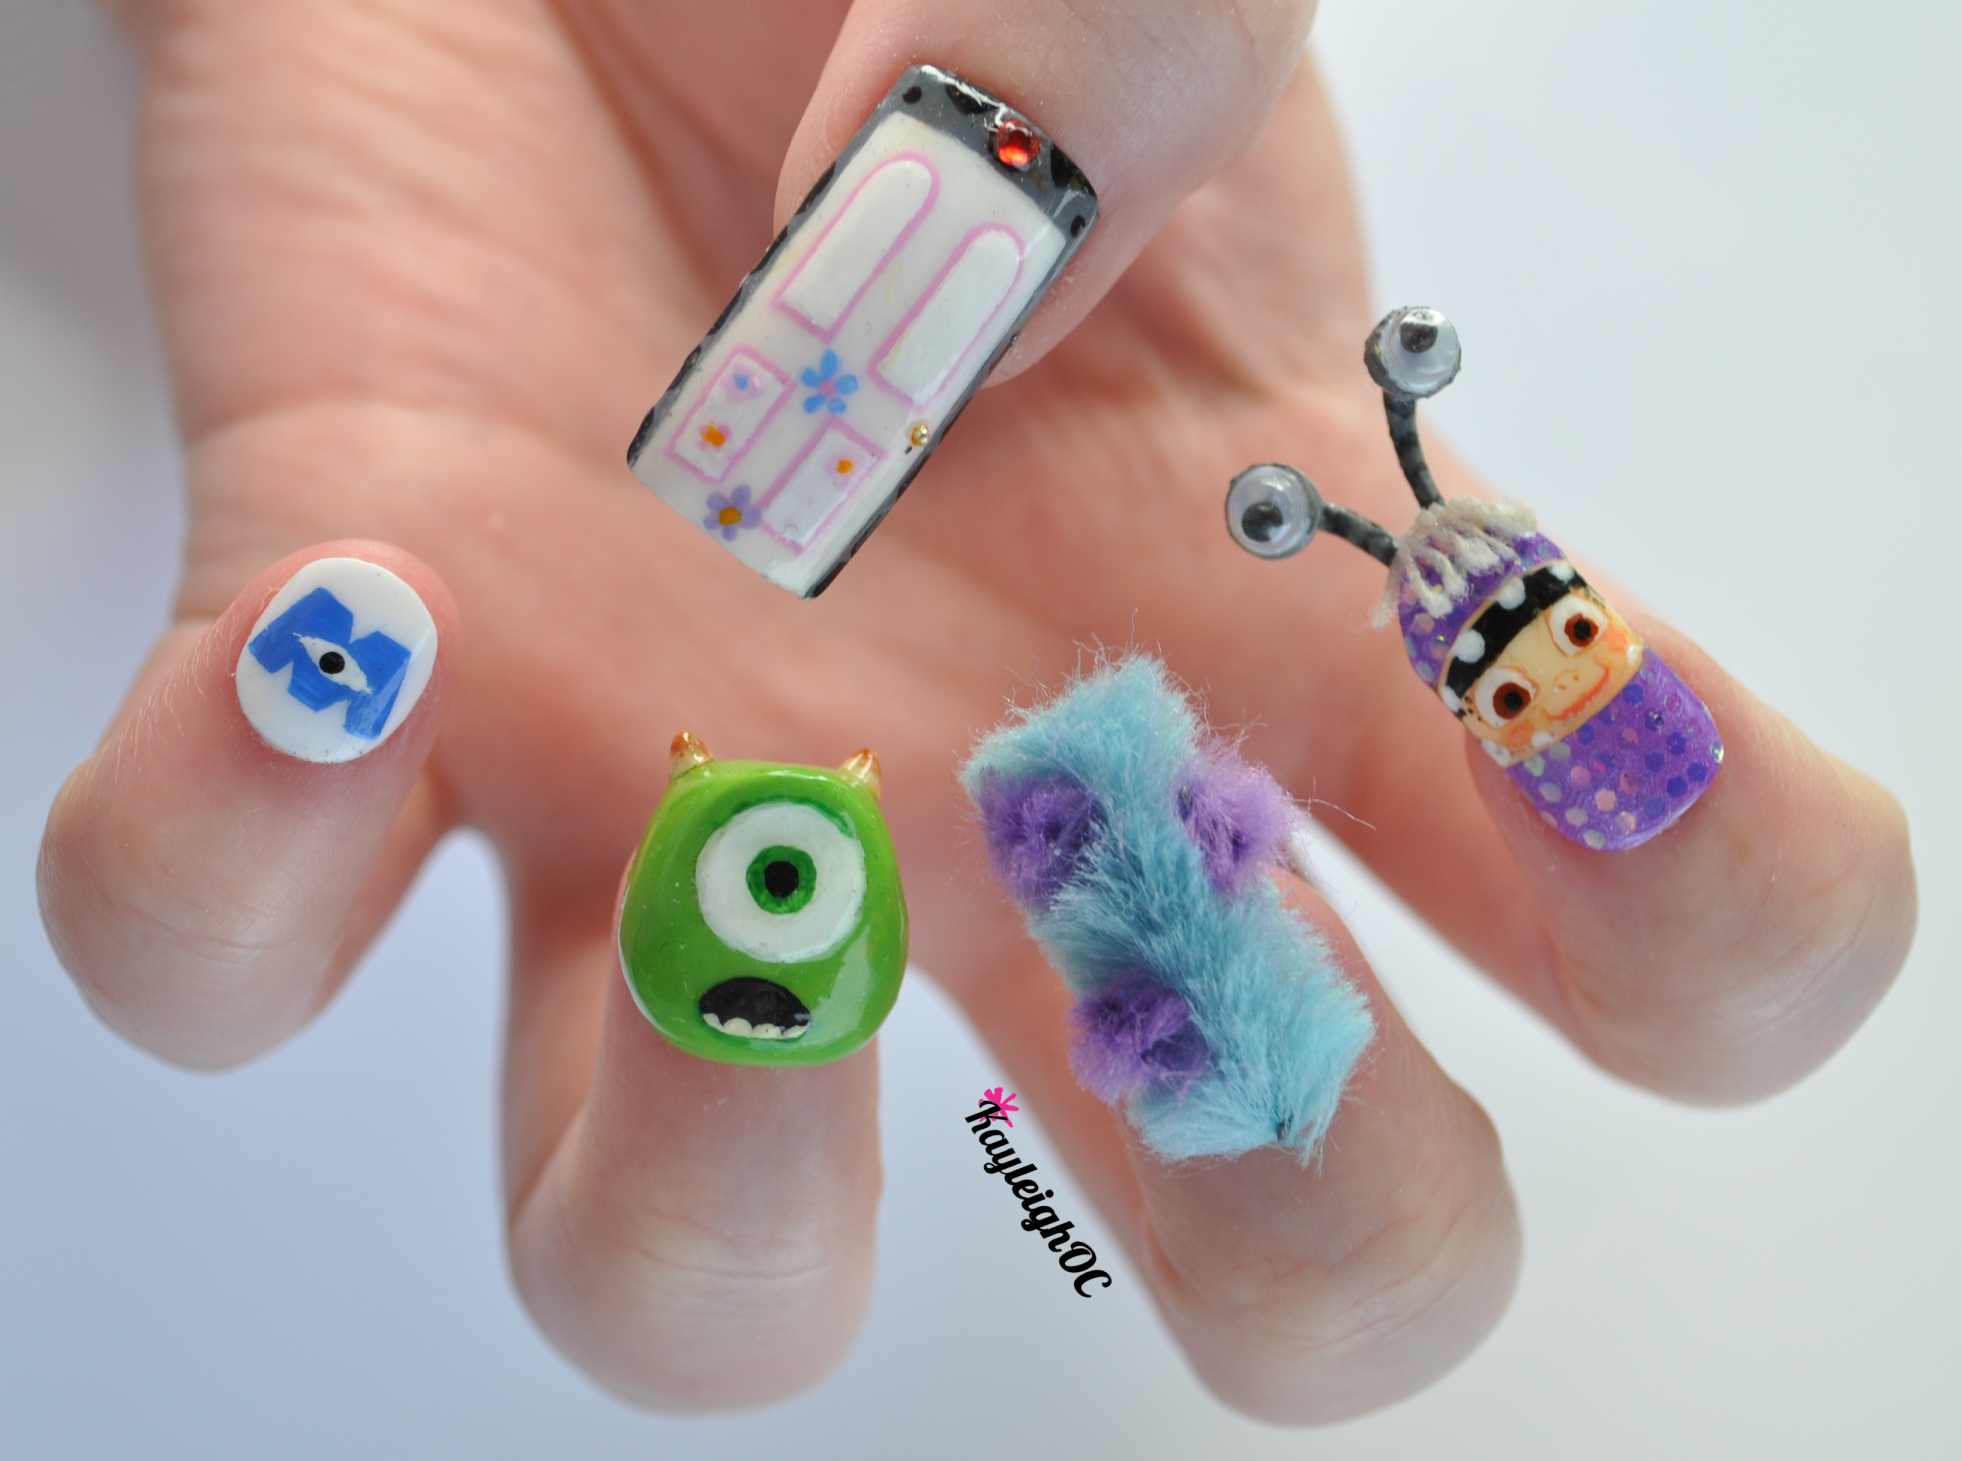 Monsters Enco - nagels <3 | Pinterest - Nagel